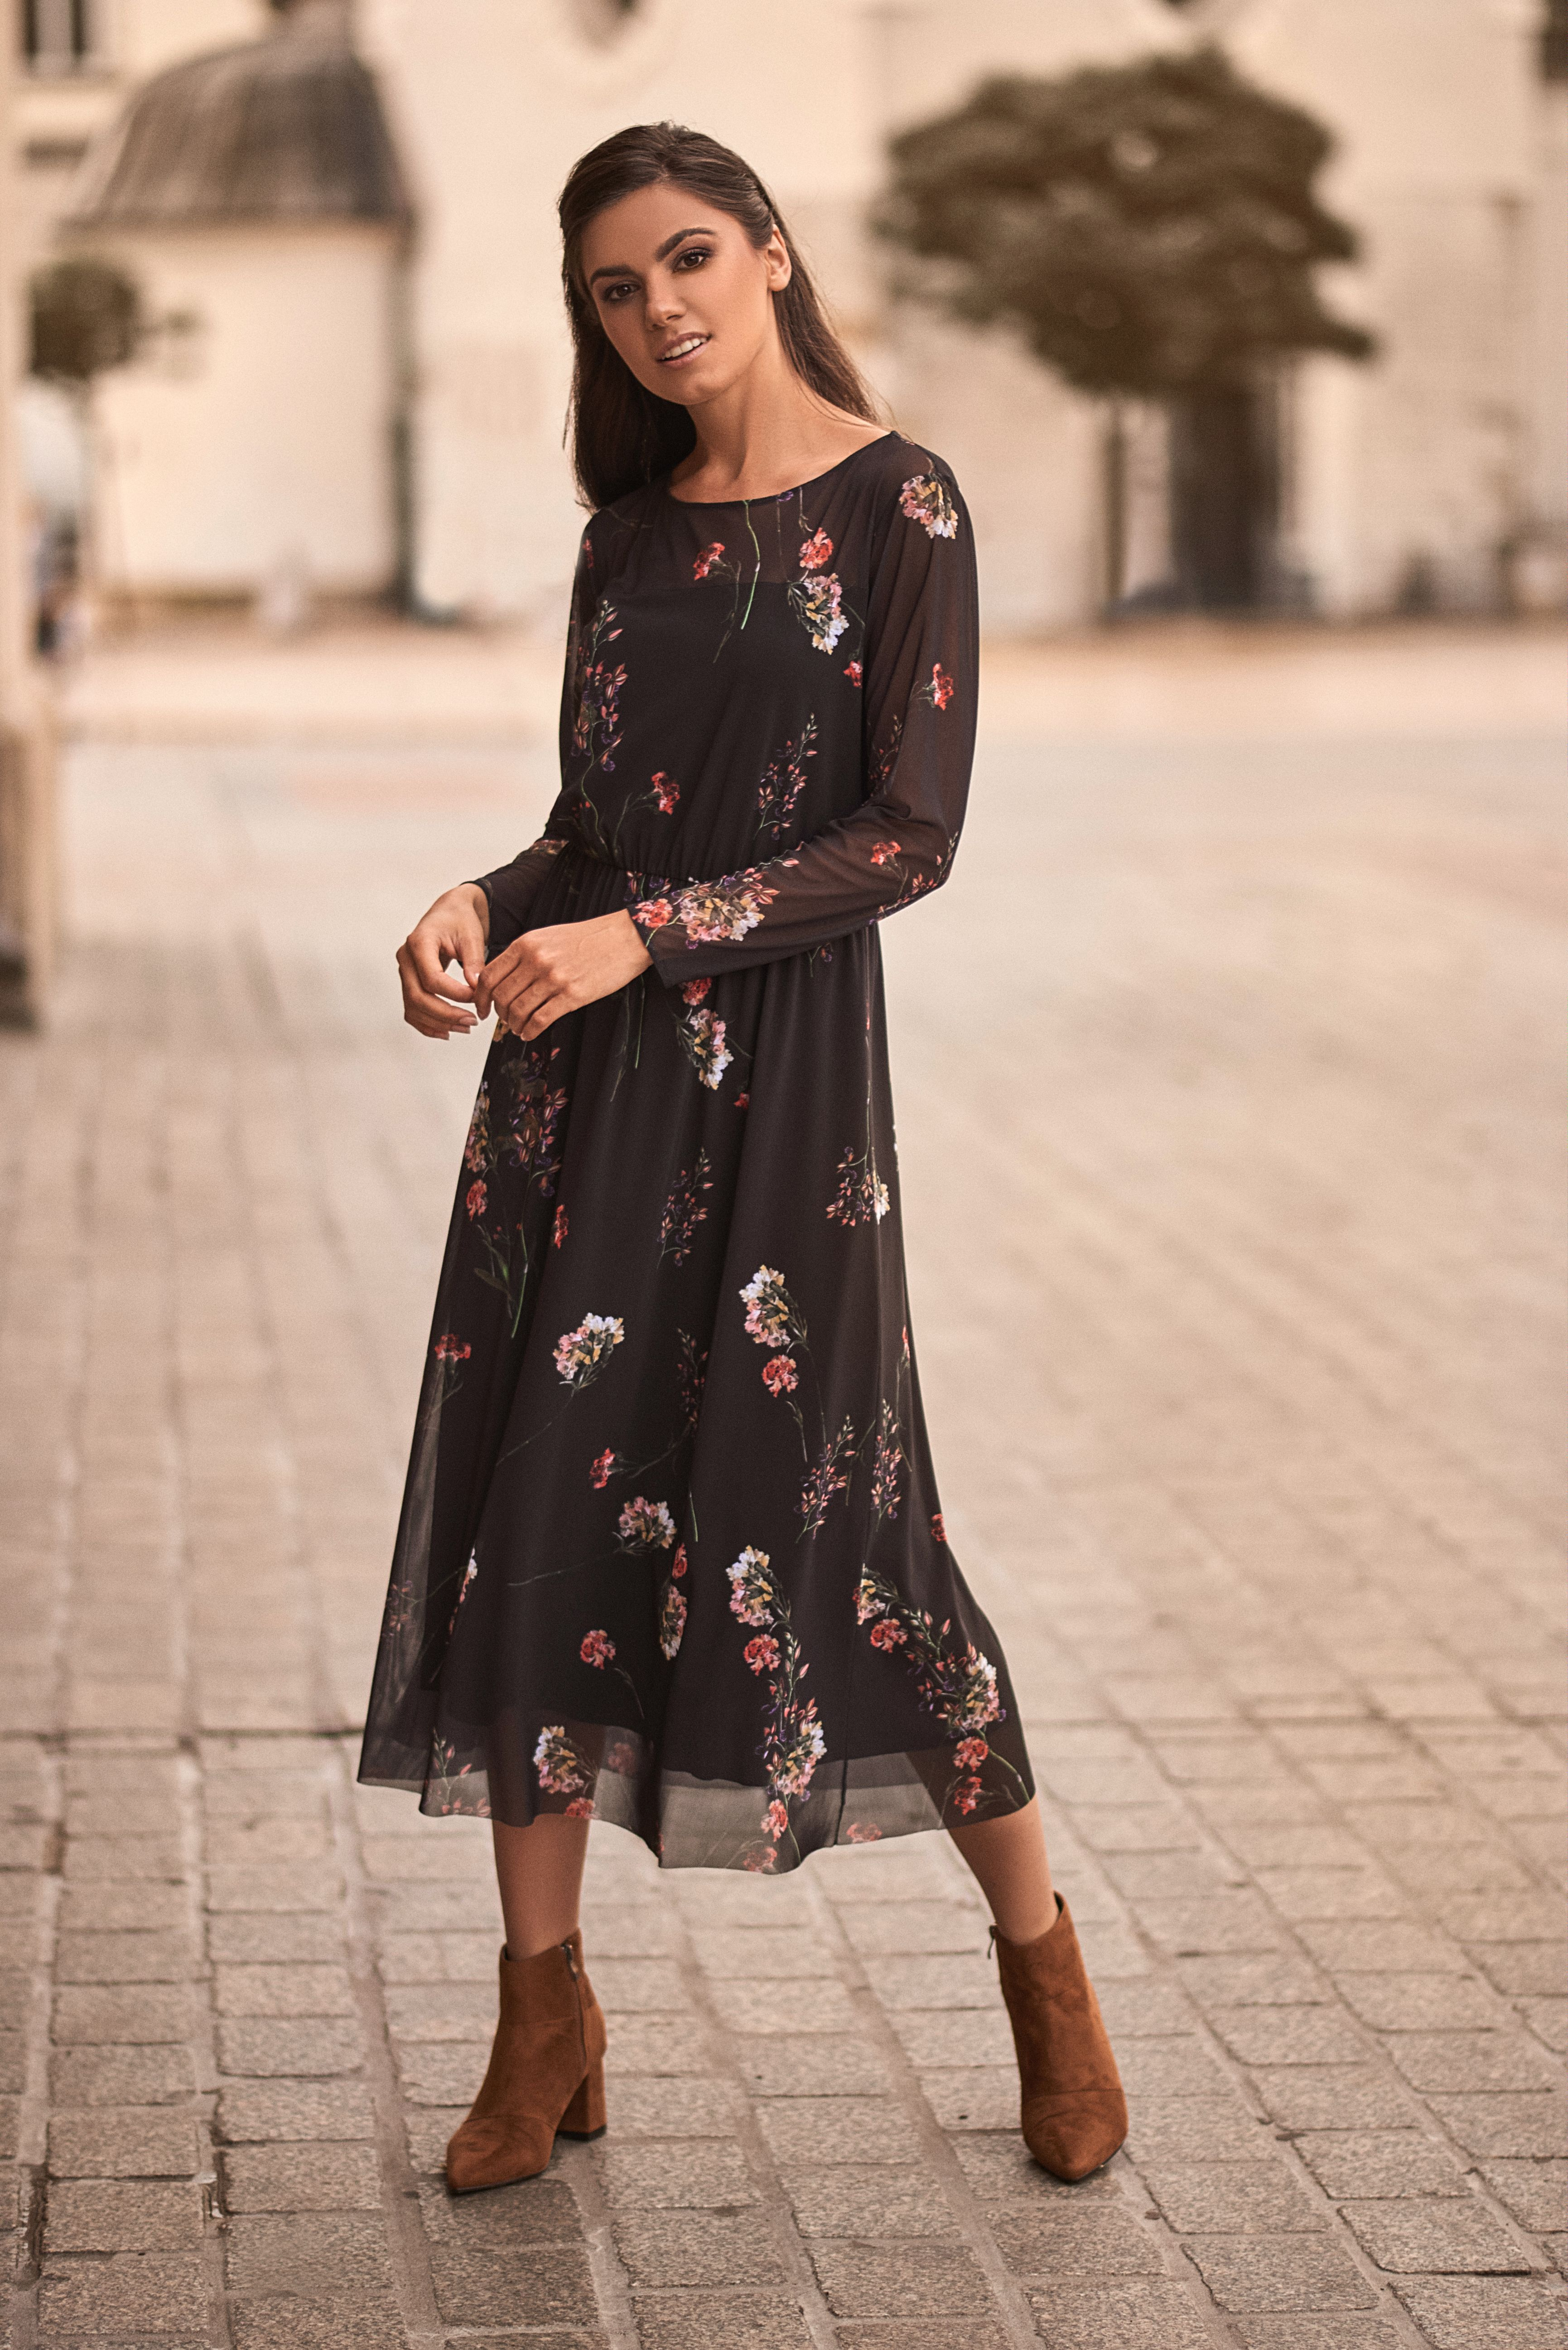 Sukienka Midi W Kwiaty Long Dress Long Sleeve Dress Dresses With Sleeves